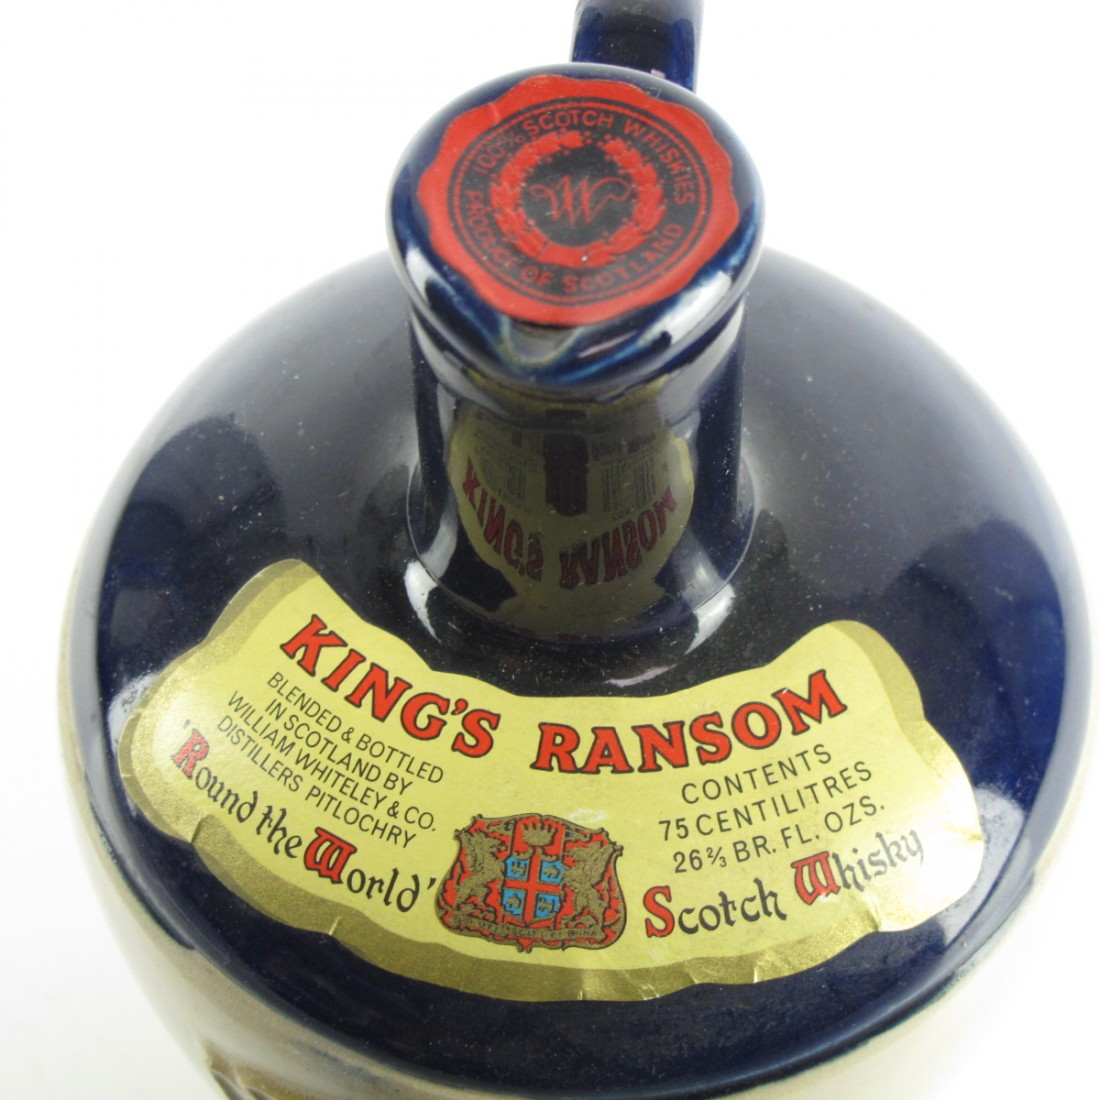 King's Ransom 'Around The World' Scotch Whisky 1970s